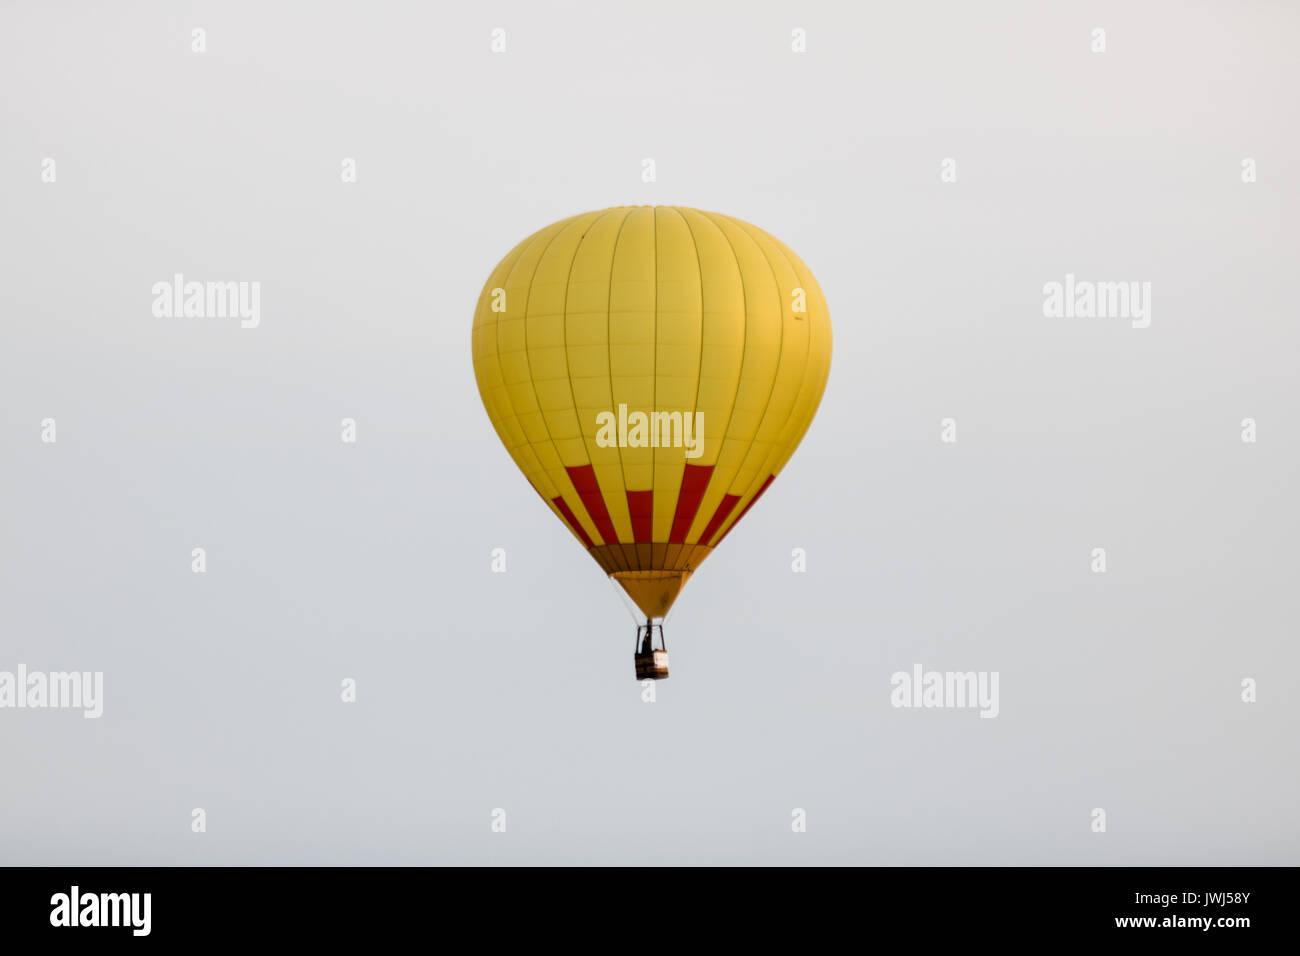 Hot Air Balloon Basket Isolated Stock Photos & Hot Air Balloon ...